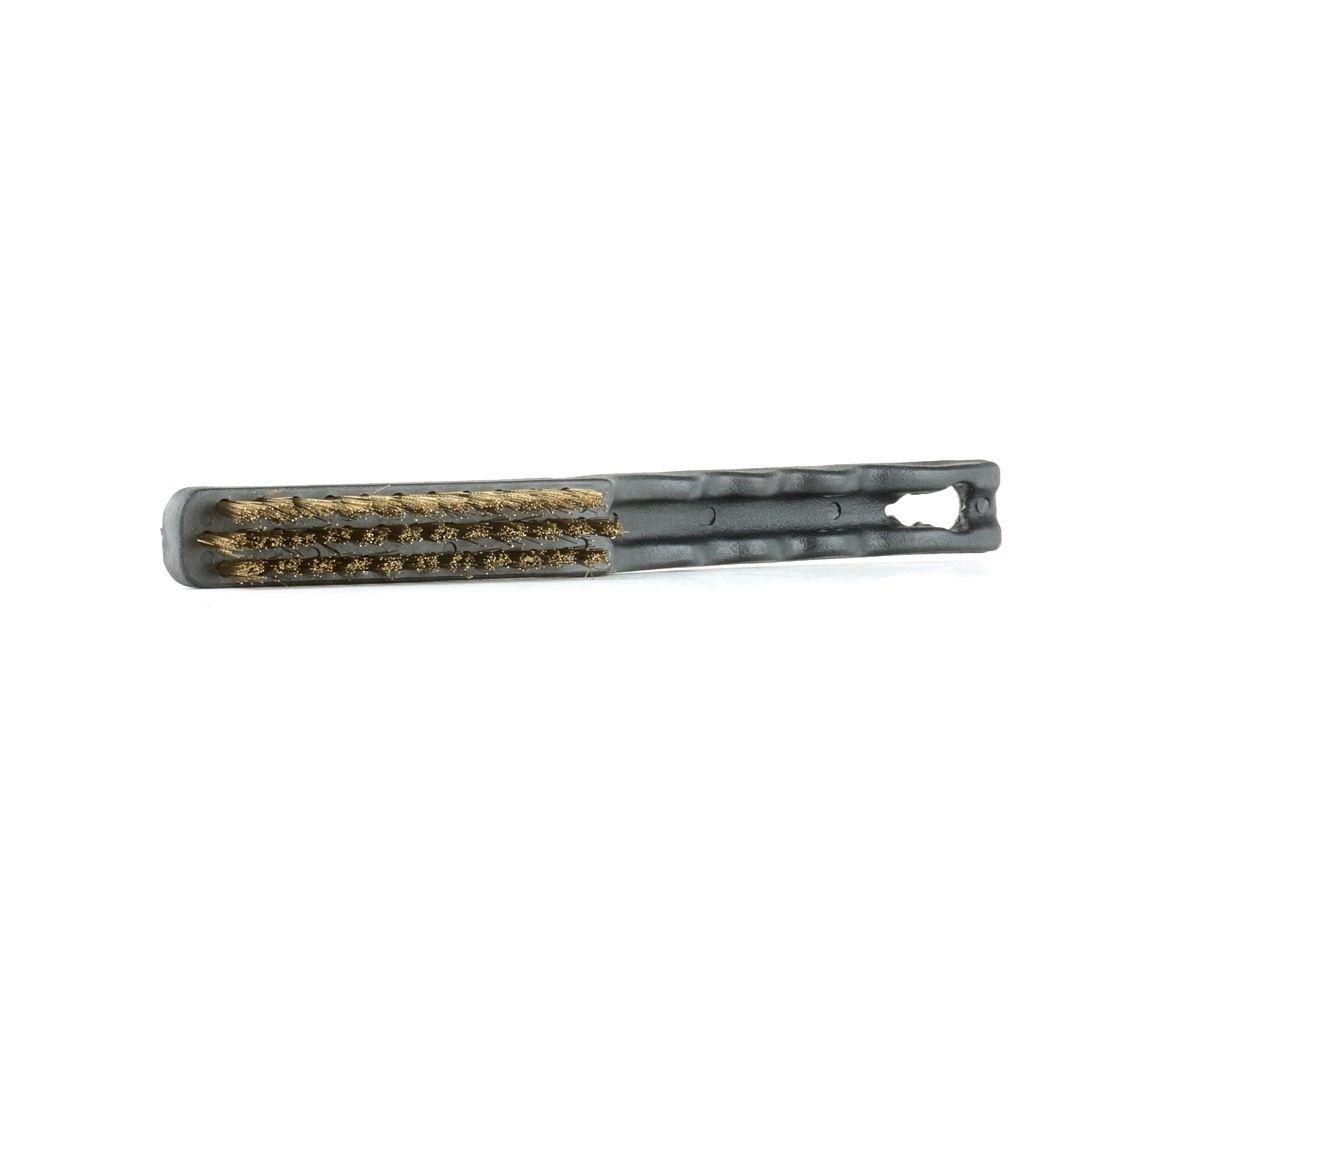 9U3003 FORCE Länge: 220mm, Metall Zündkerzenbürste 9U3003 kaufen